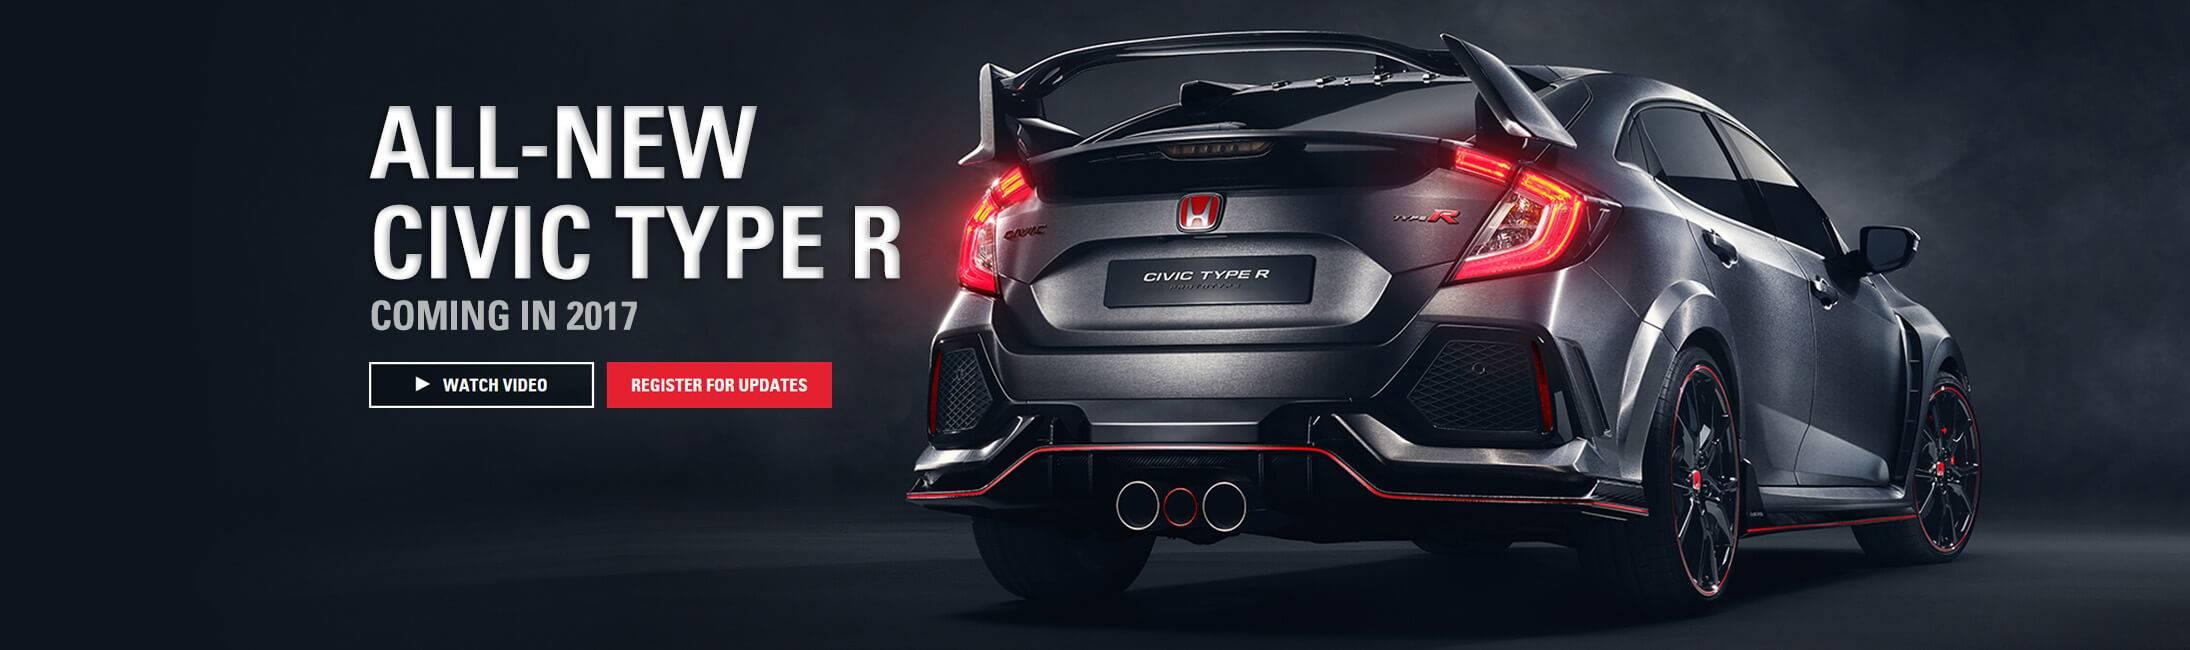 Honda Civic Type R - Coming Soon